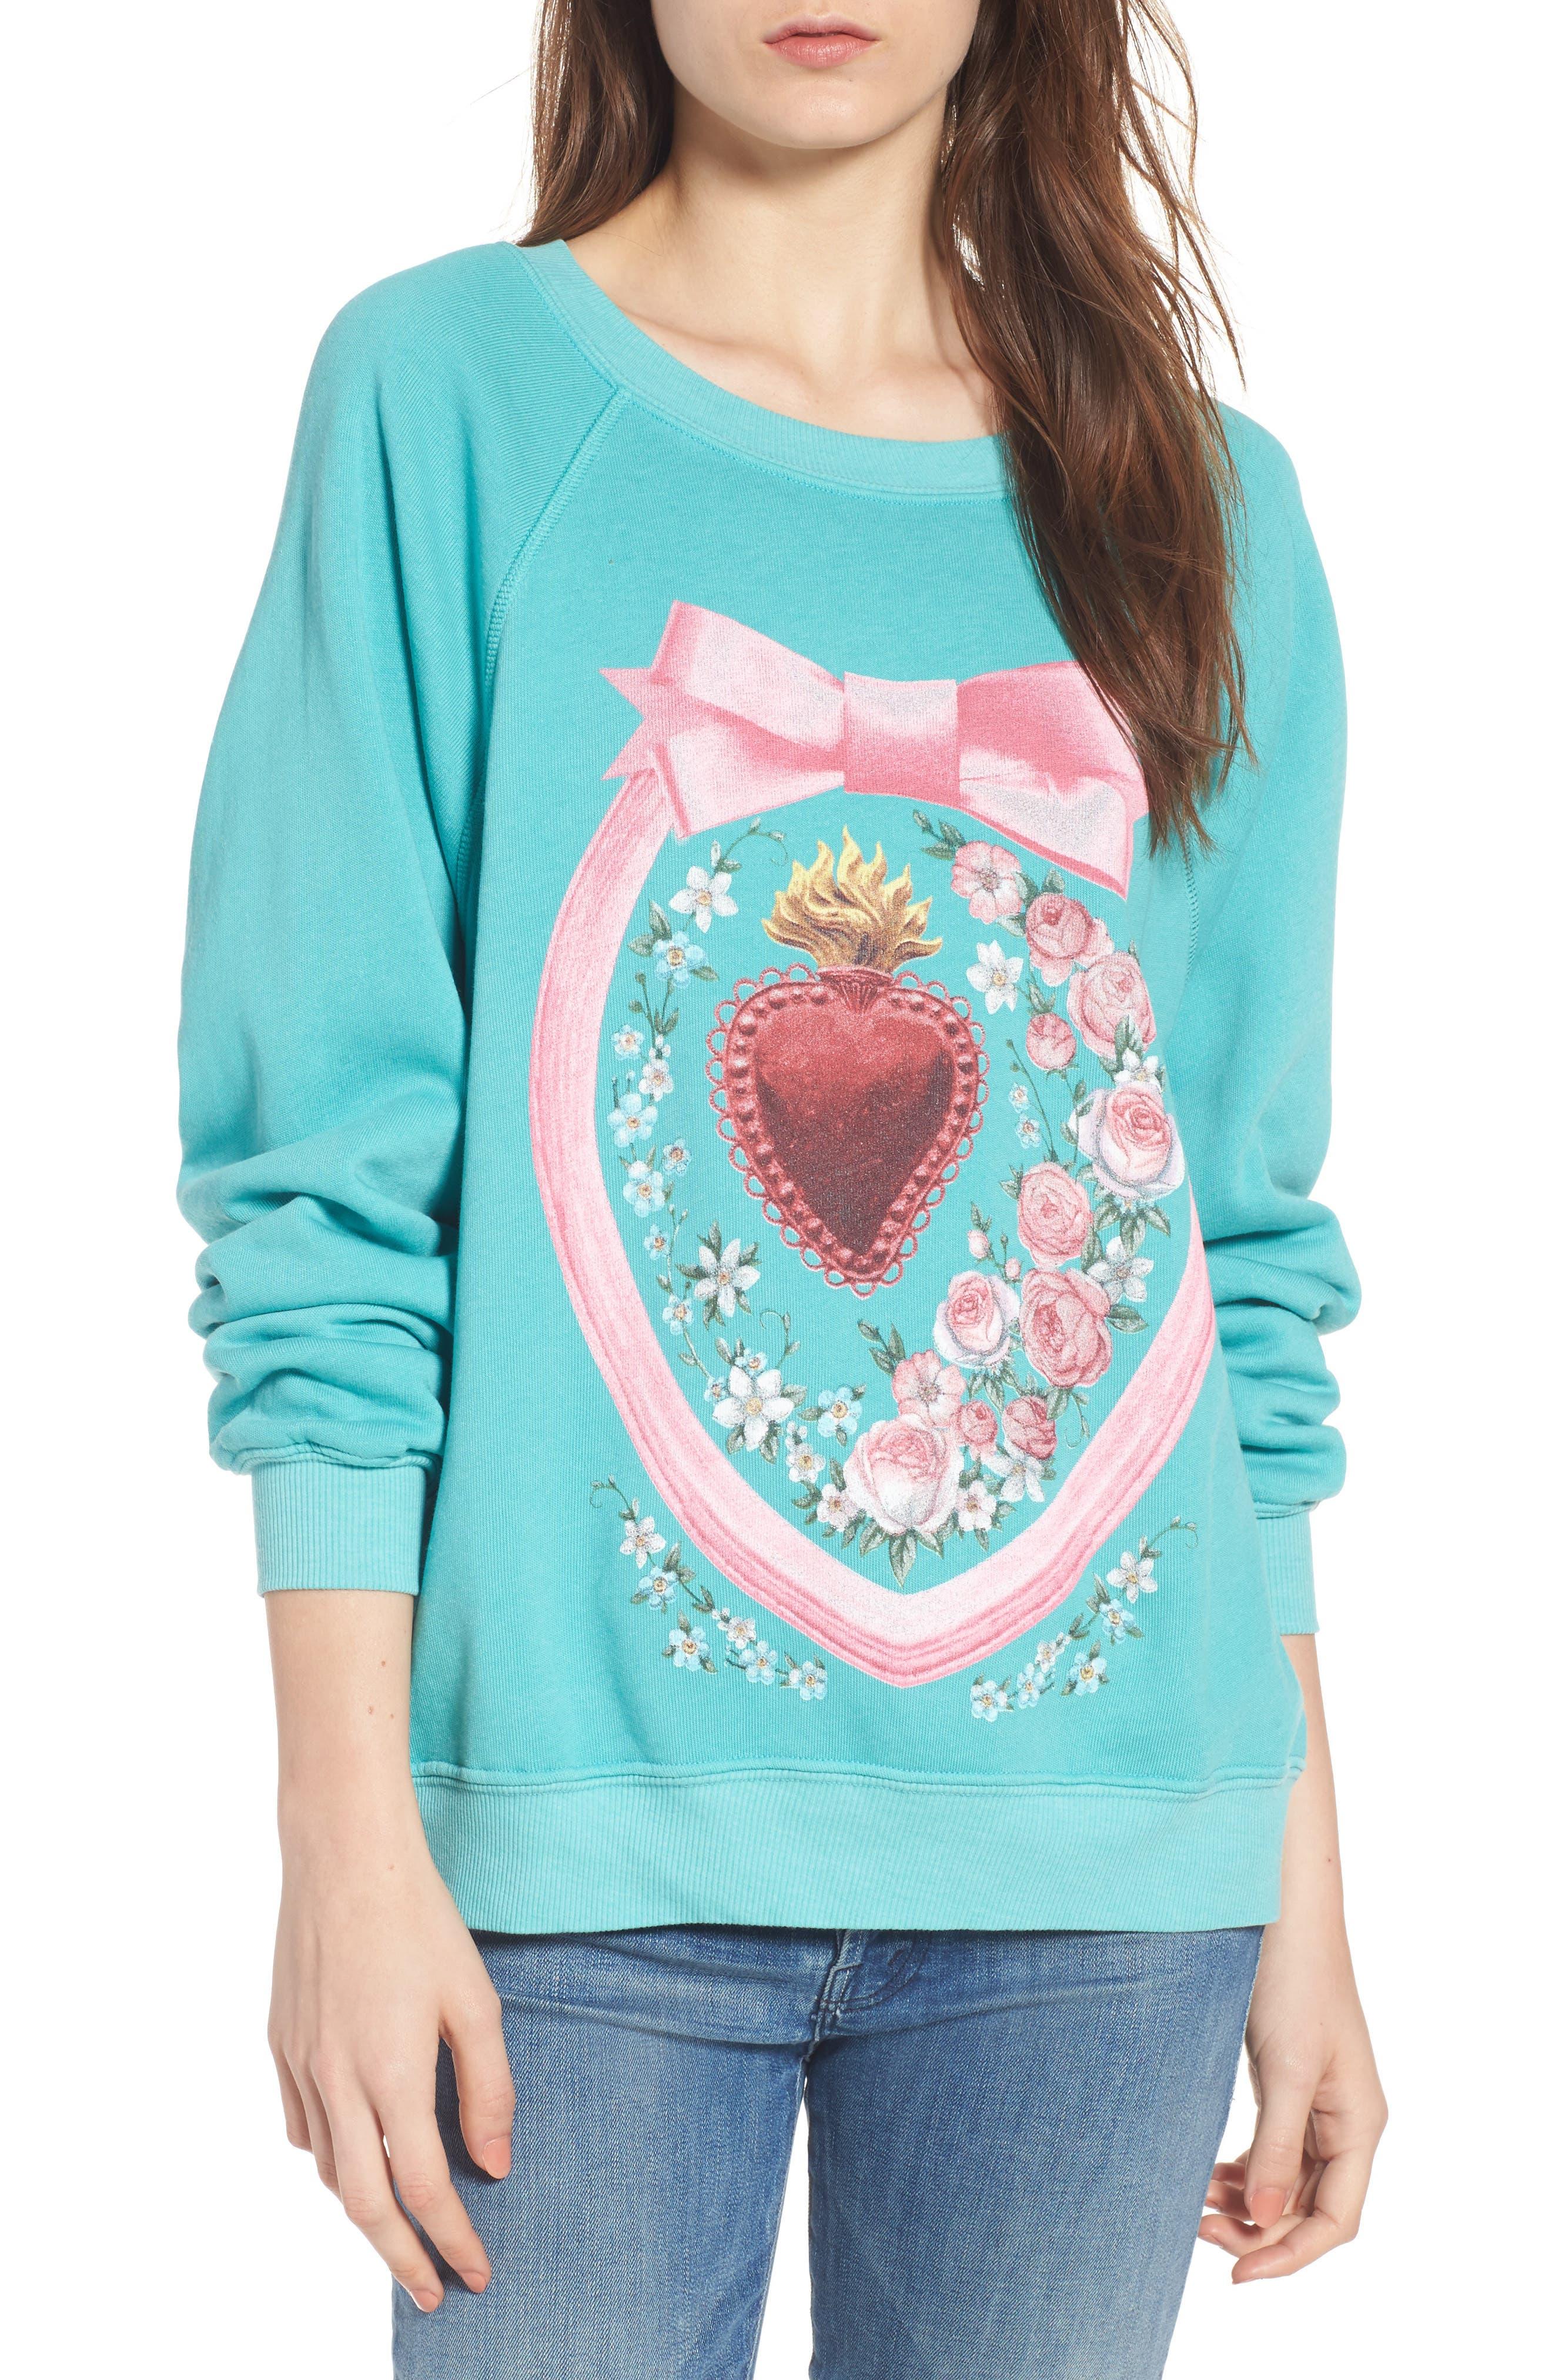 Main Image - Wildfox Heirlooms Sommers Sweatshirt